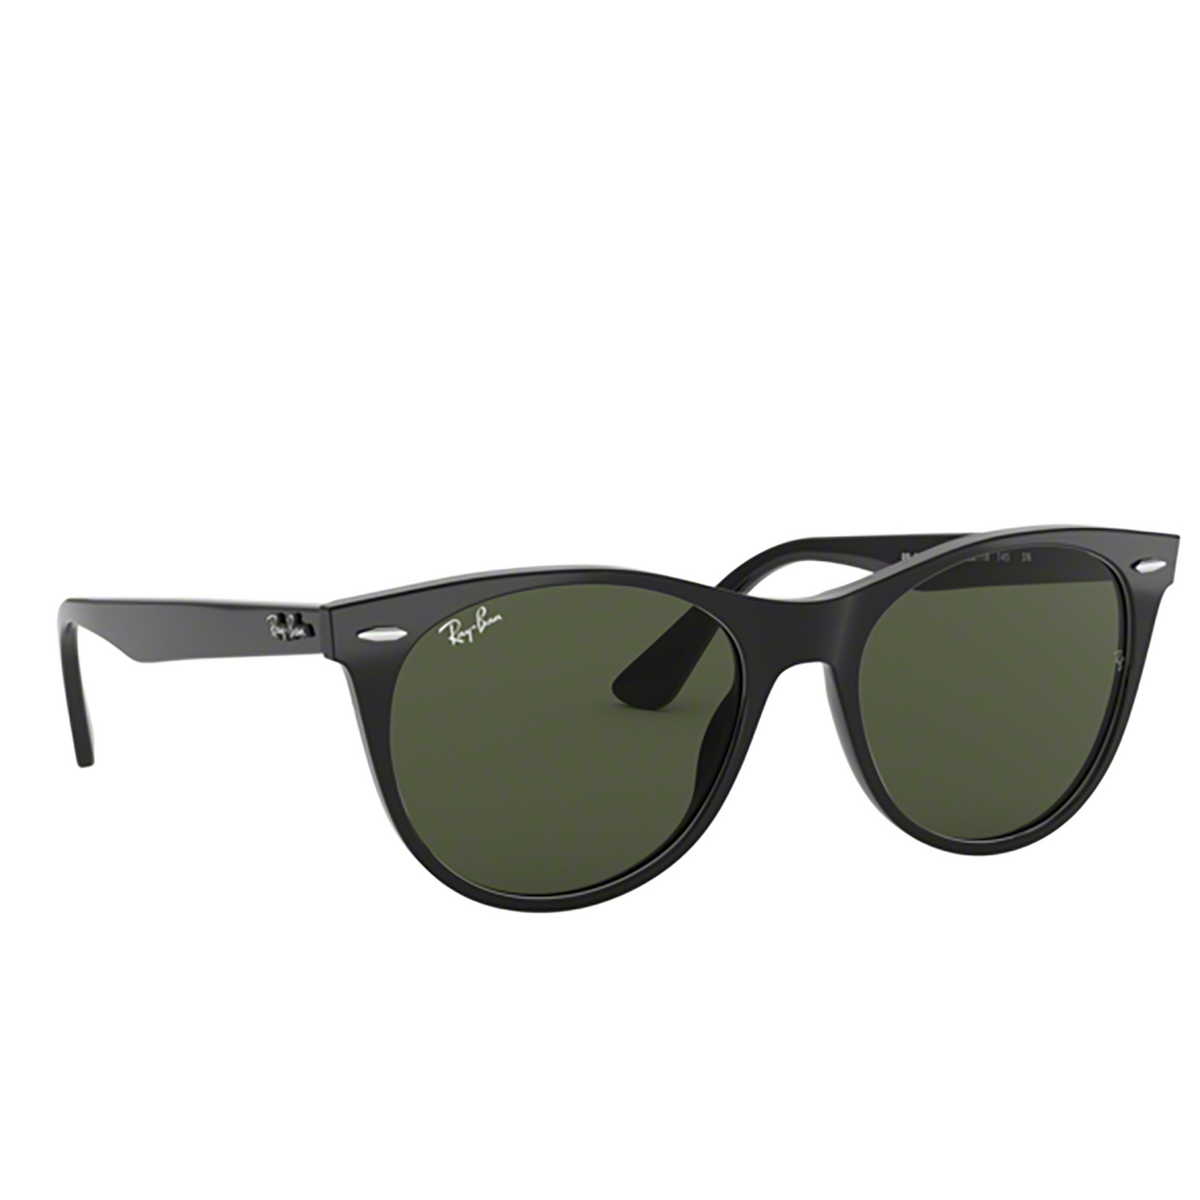 Ray-Ban® Square Sunglasses: Wayfarer Ii RB2185 color Black 901/31 - three-quarters view.